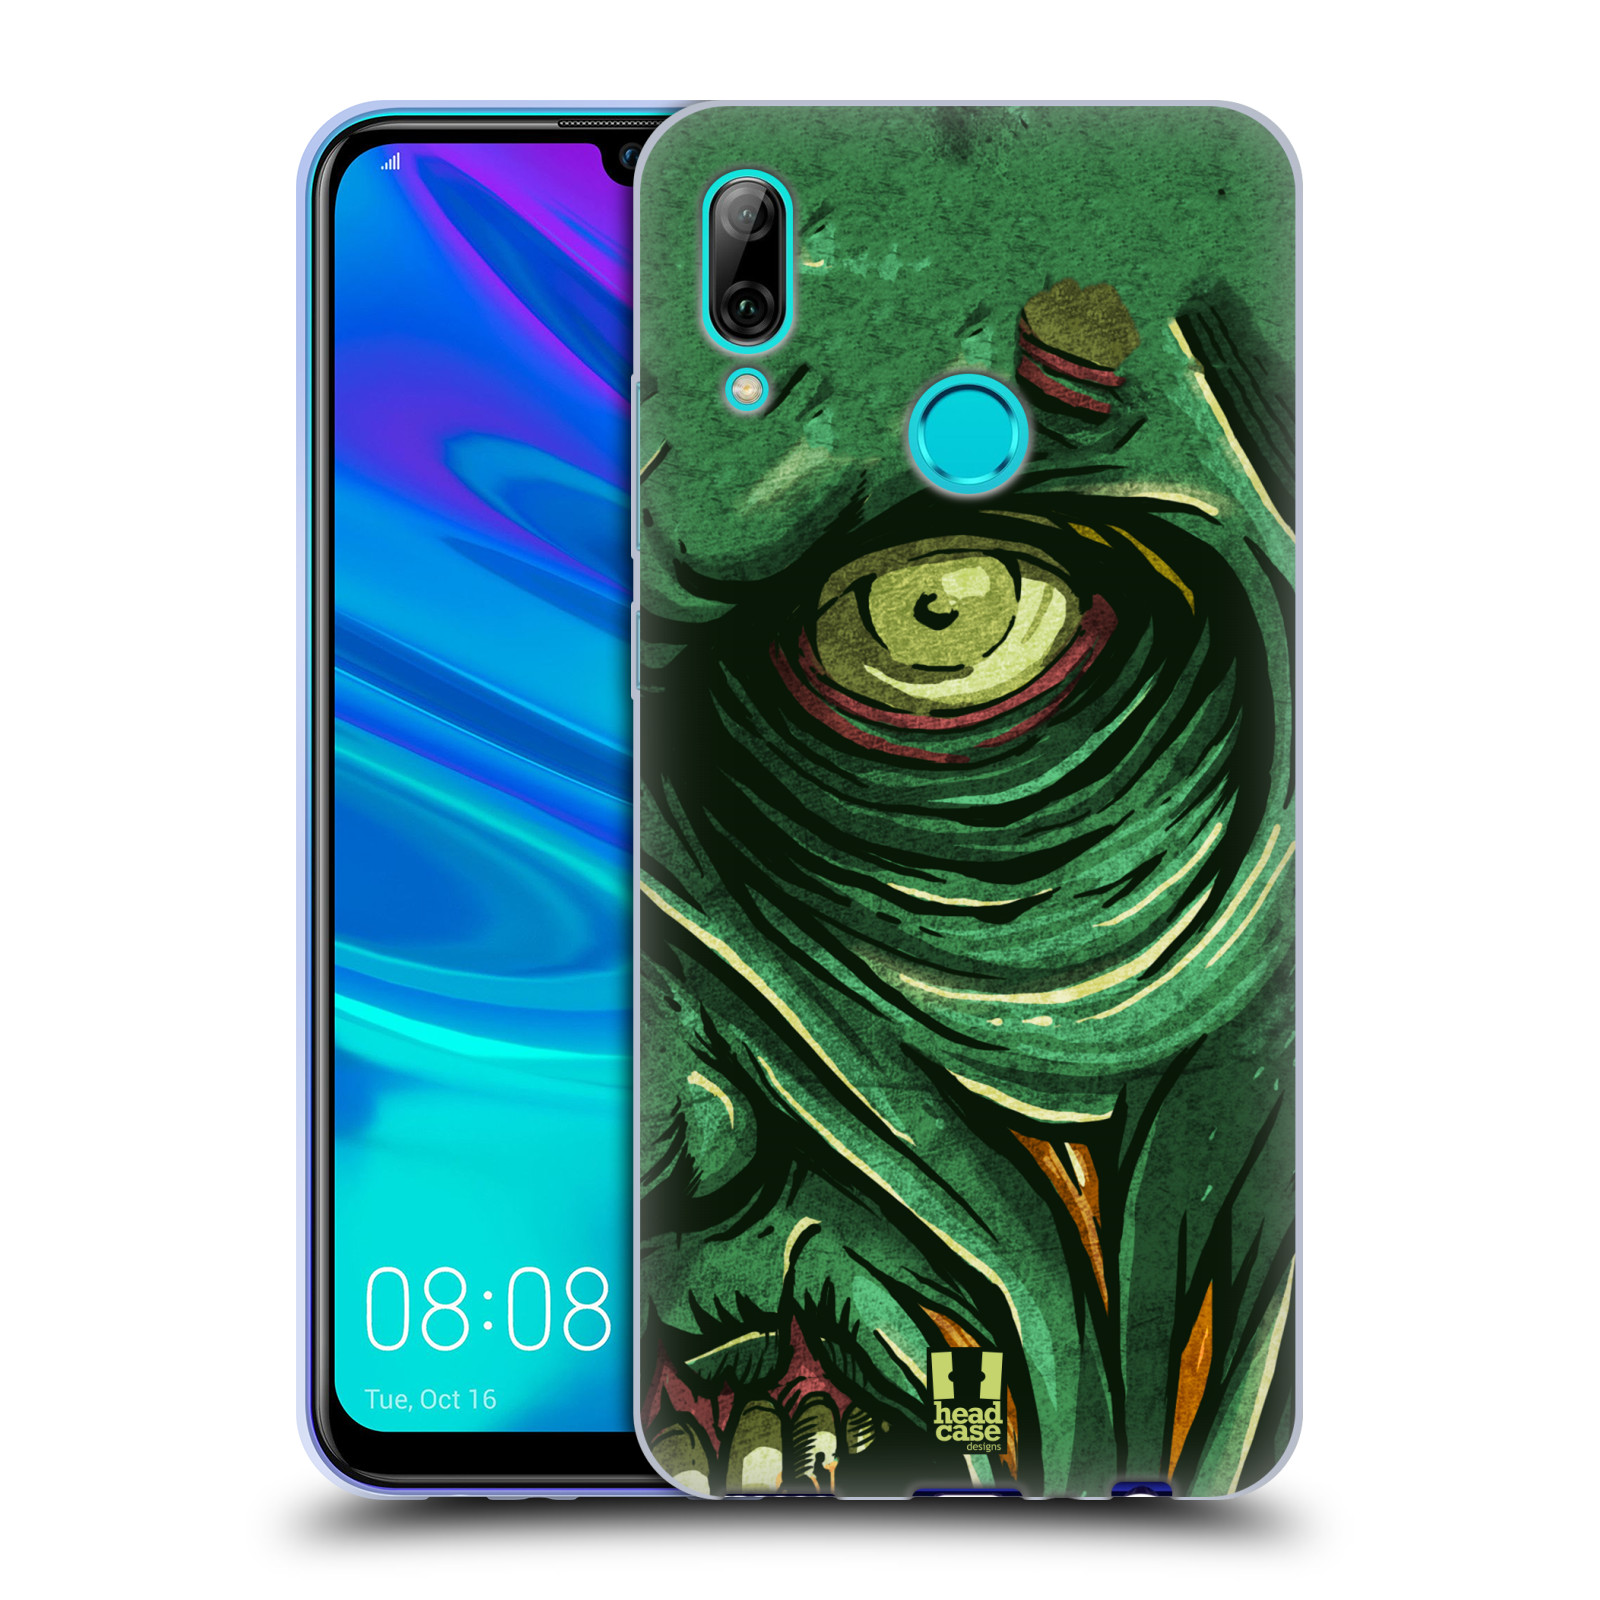 Silikonové pouzdro na mobil Huawei P Smart (2019) - Head Case - ZOMBIE TVÁŘ